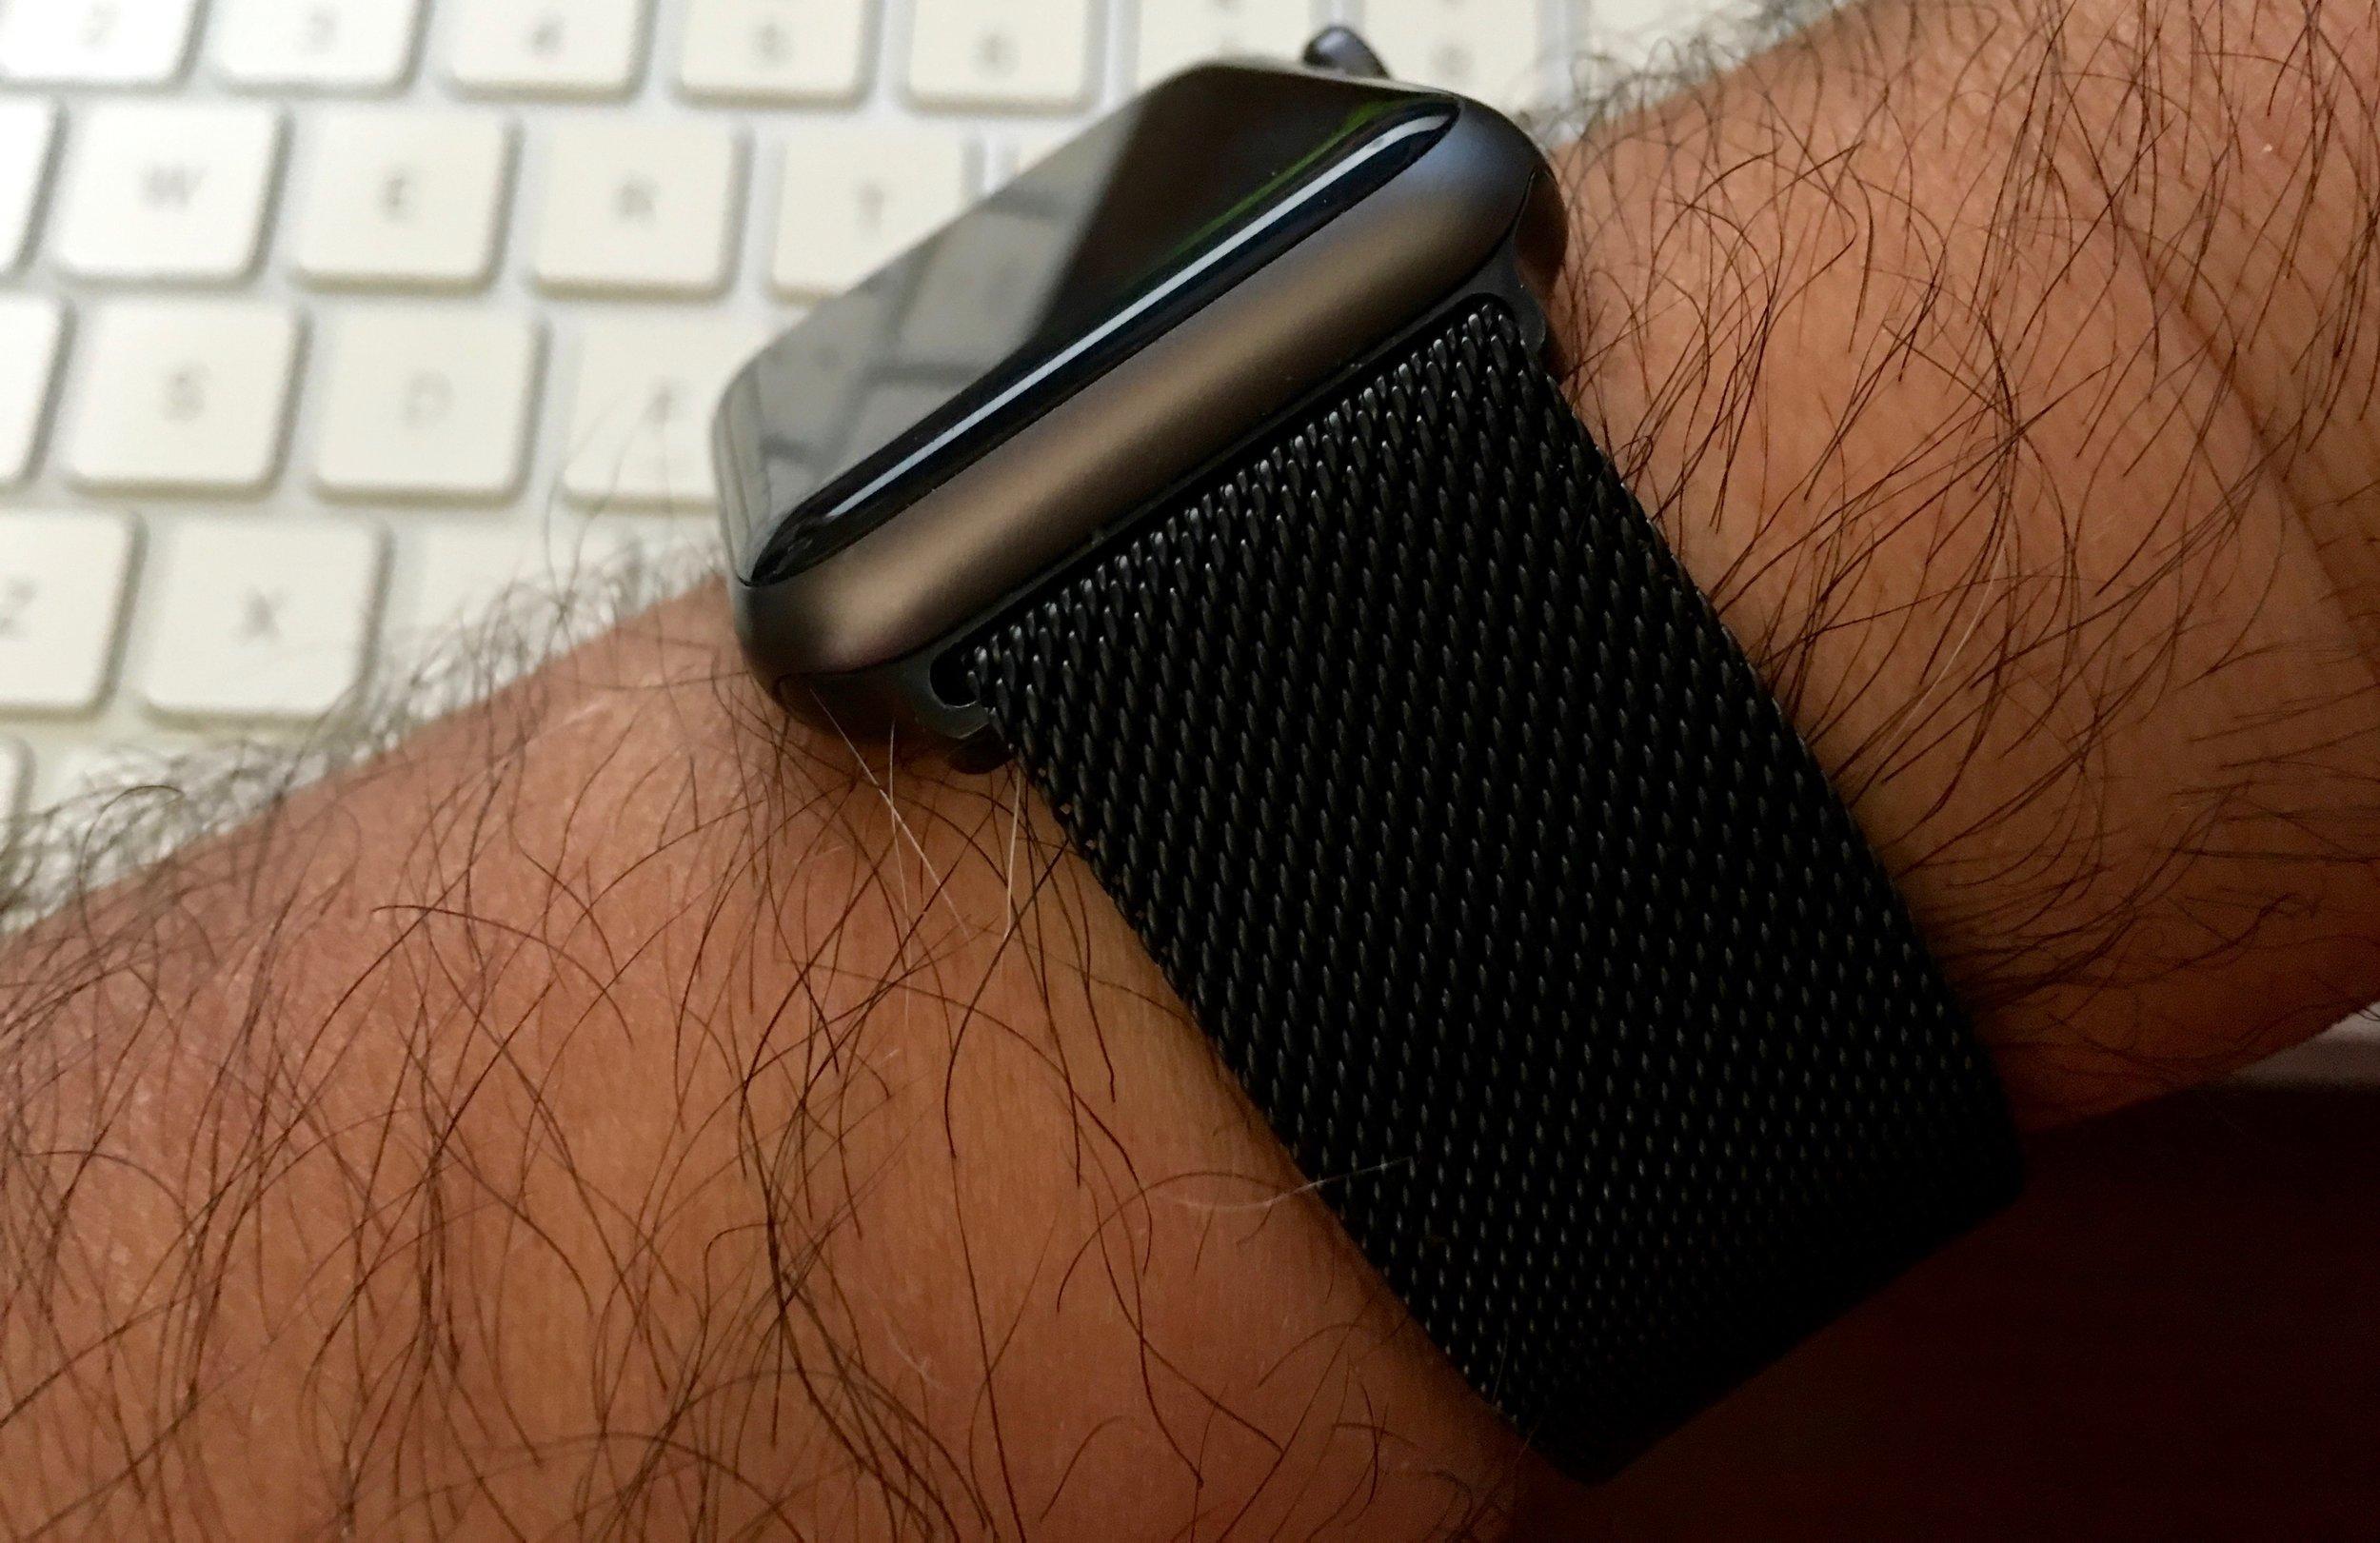 The black X-Doria Mesh Band on Steve's hairy wrist. Photo ©2016, Steven Sande